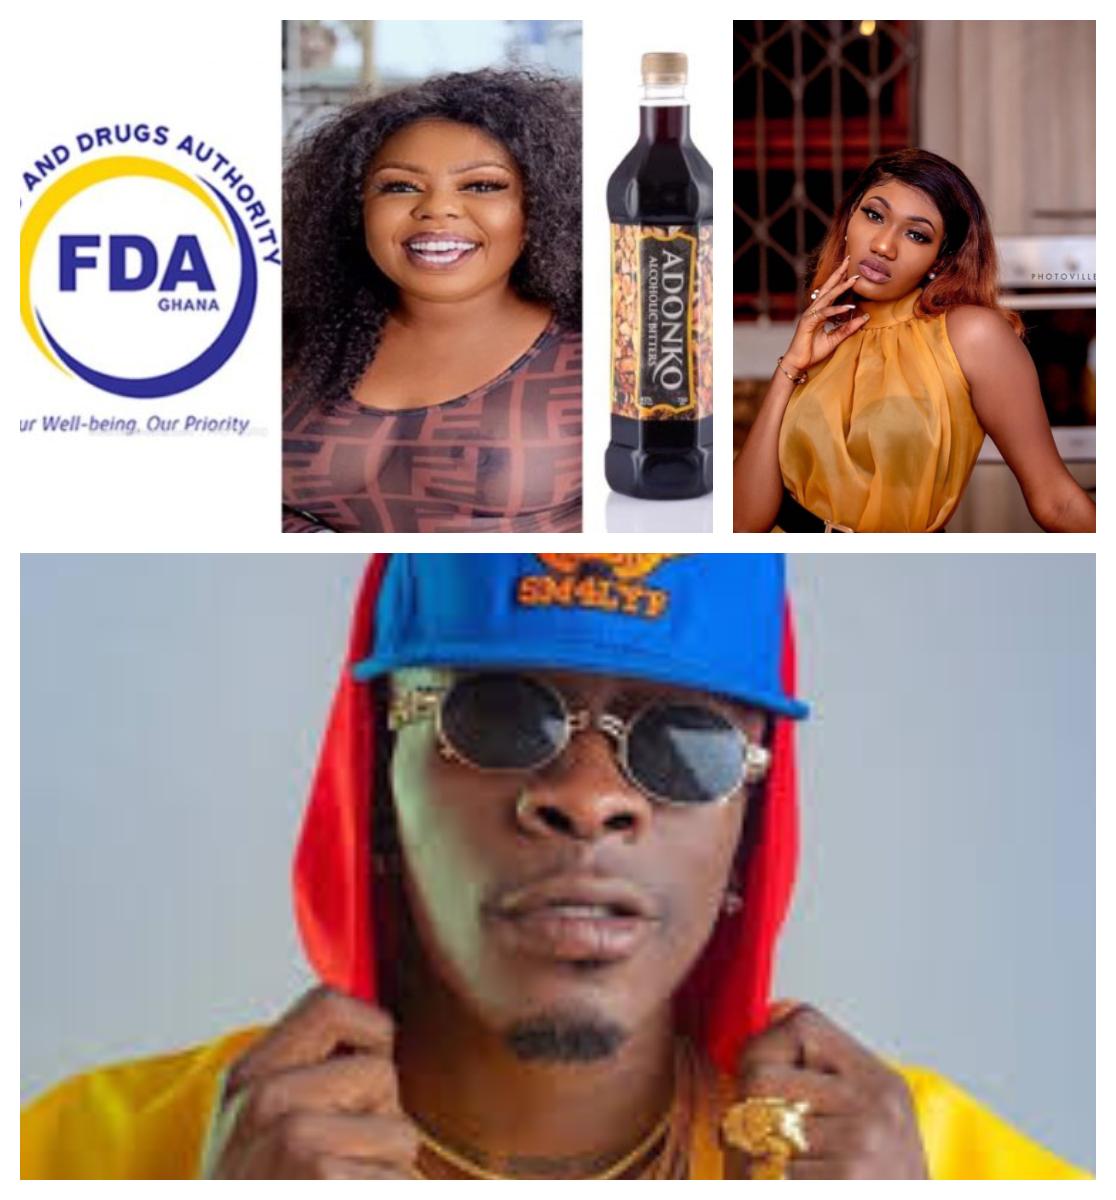 Celebrities Go Wild On FDA After Adonko Bitters Sing Nigerian Celebrities As Ambassadors.